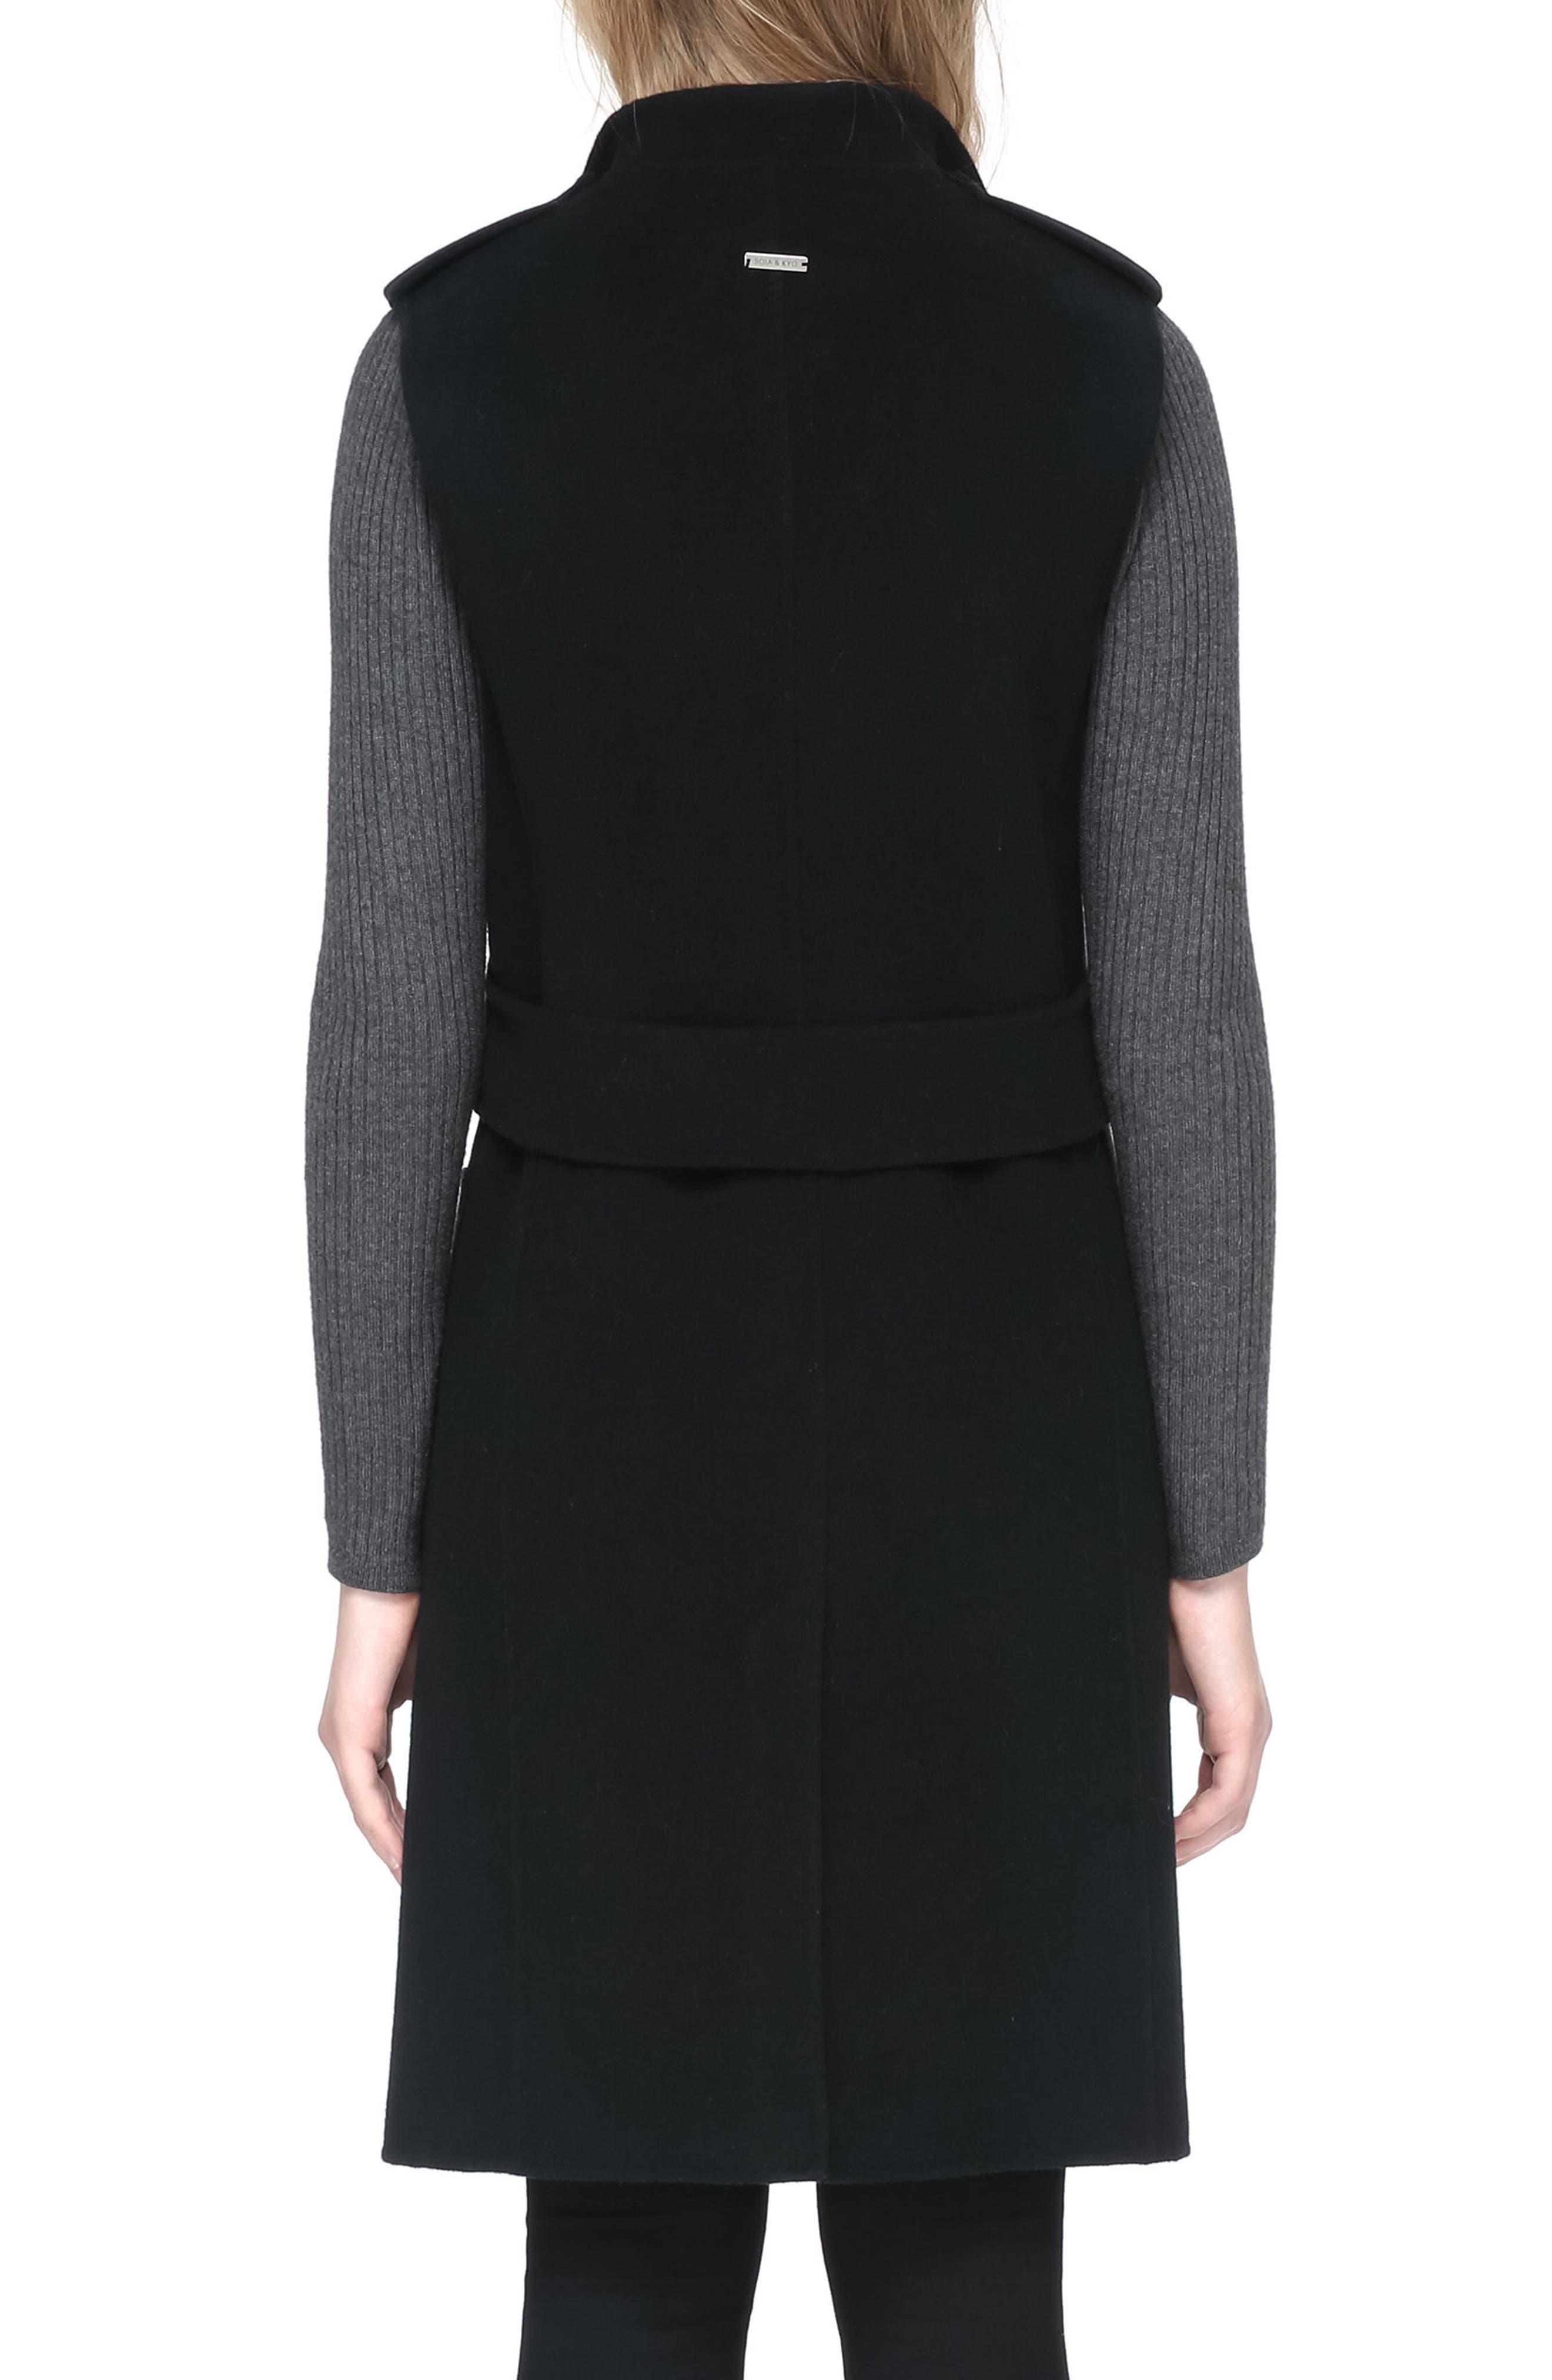 SOIA & KYO, Reversible Wool Blend Vest, Alternate thumbnail 2, color, 001